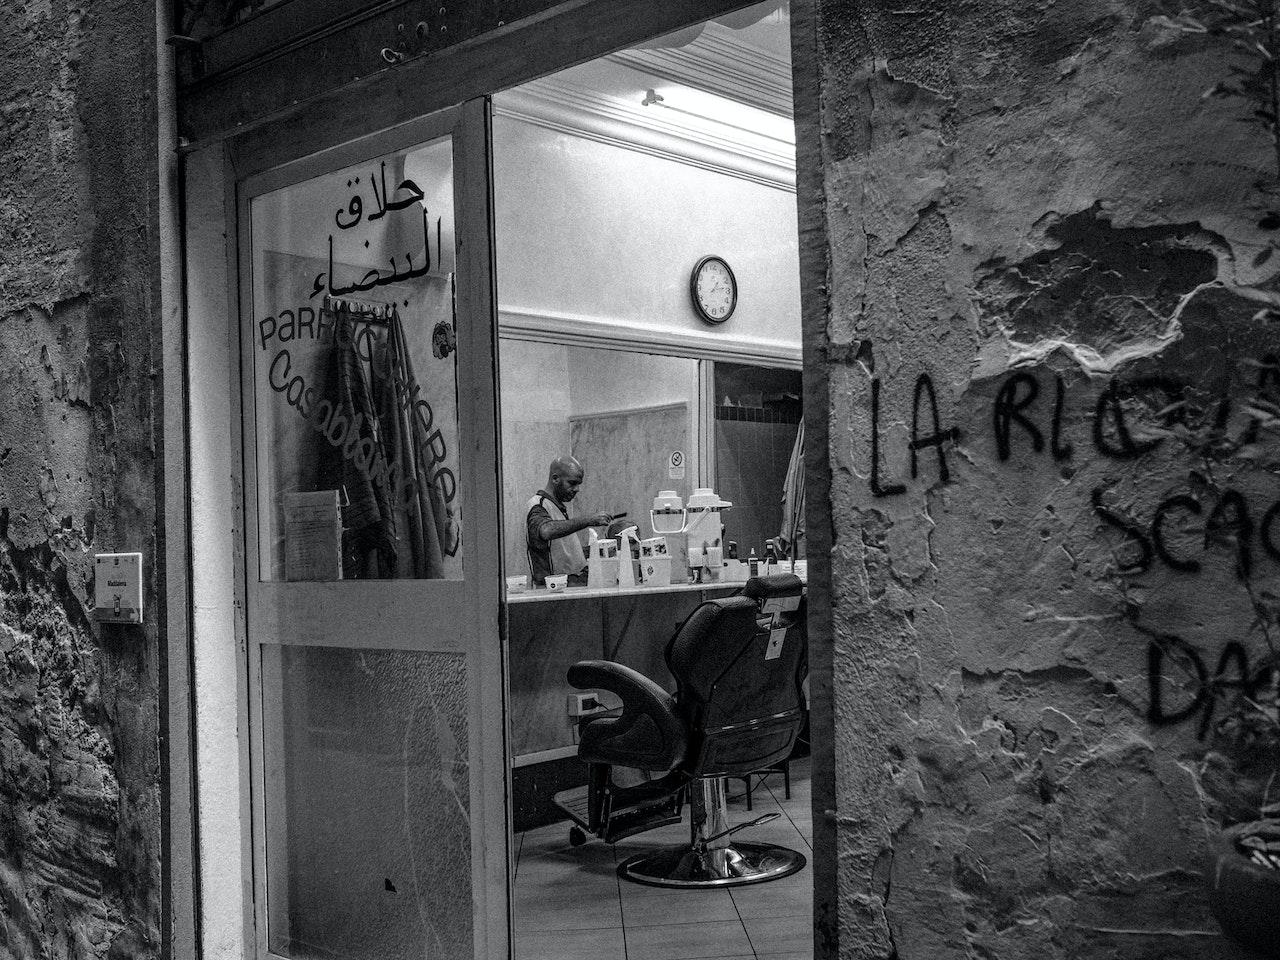 BarberShop-small